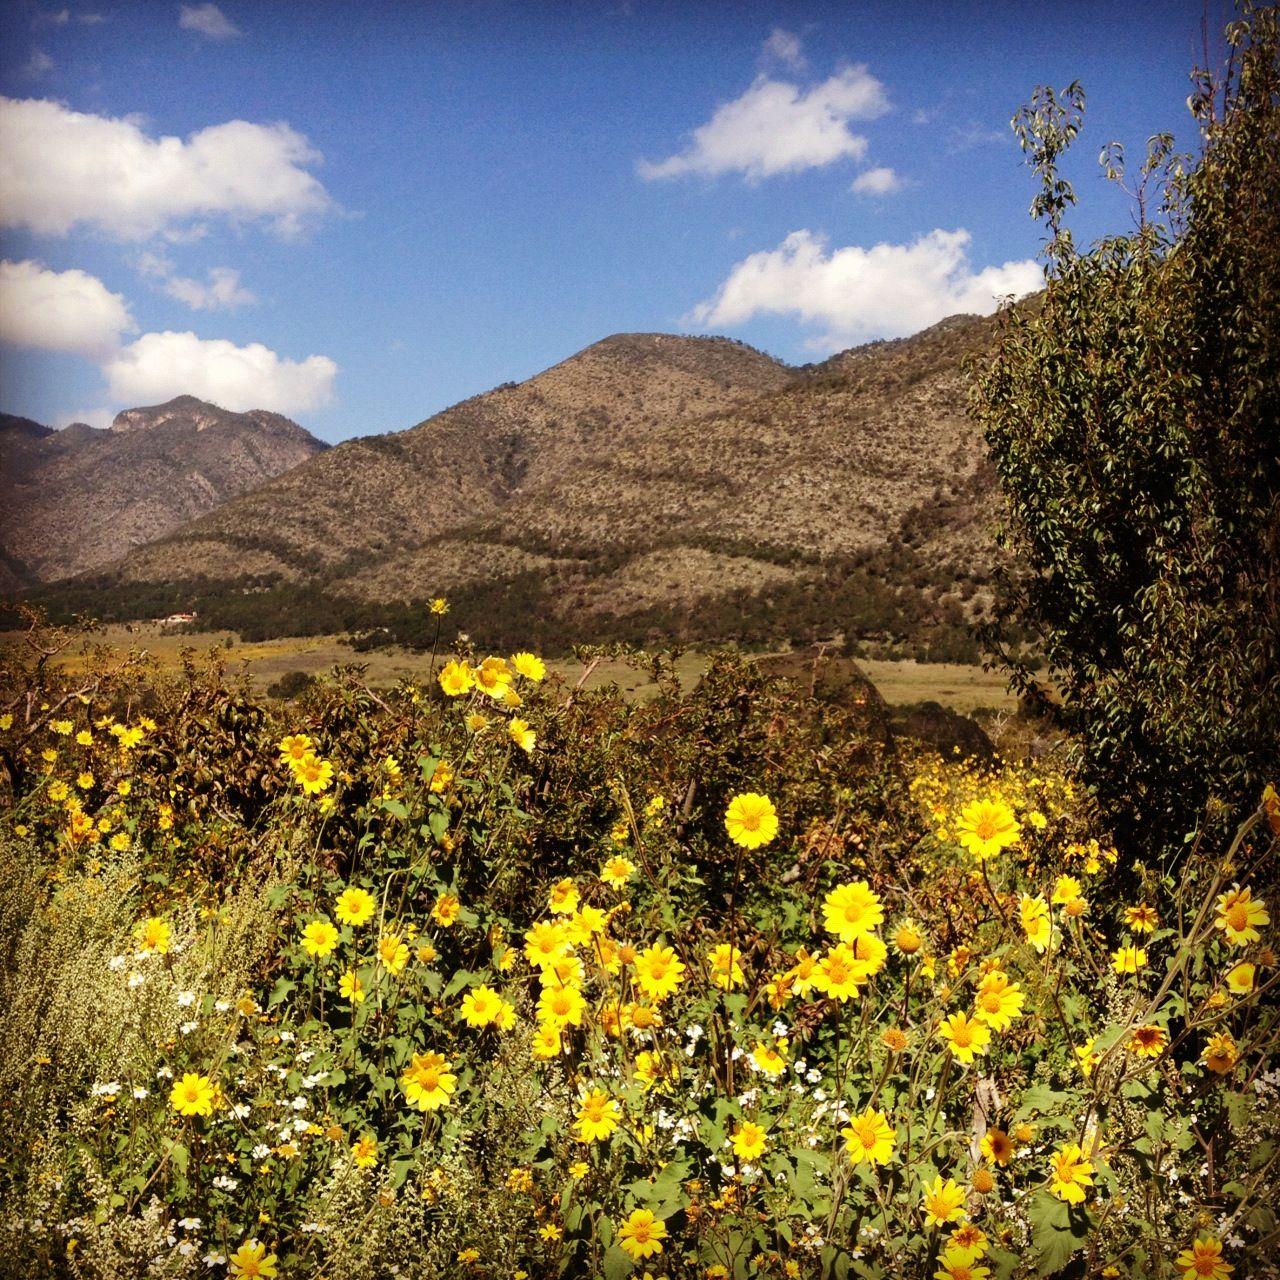 Arteaga Coahuila parte de su flora